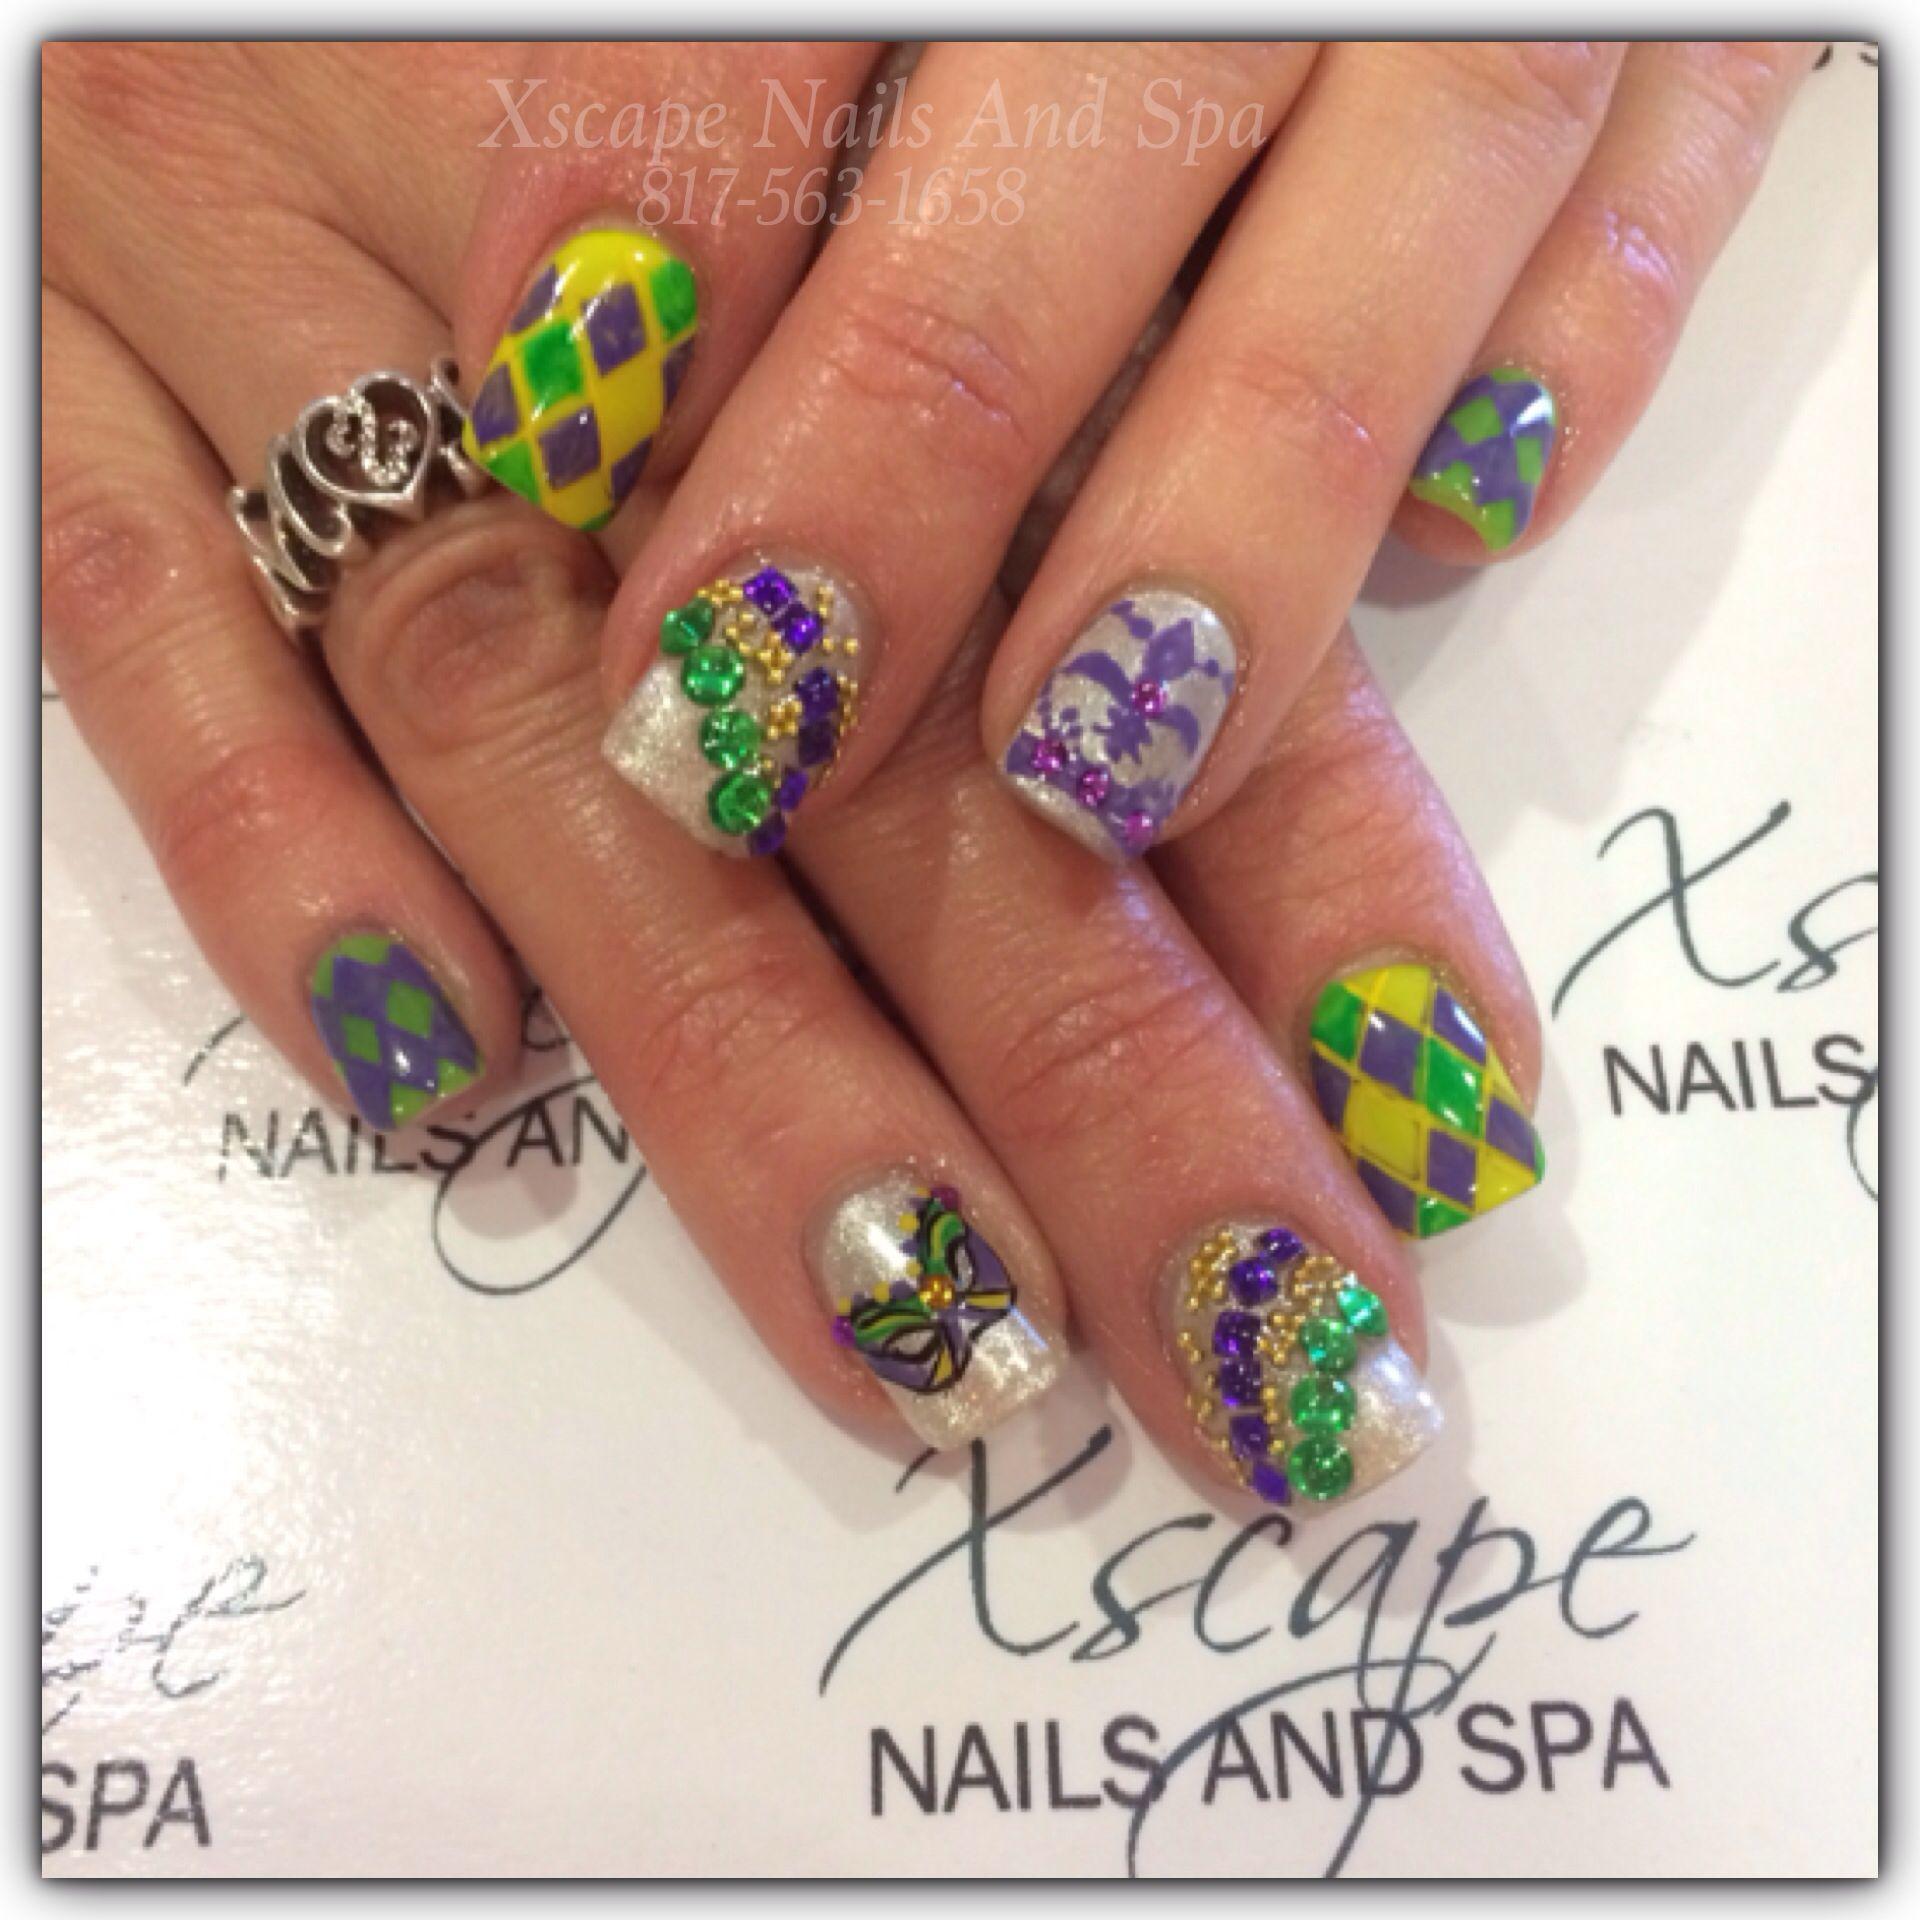 Mardi Gras Nails | Cute Nails Designs | Pinterest | Mardi gras ...